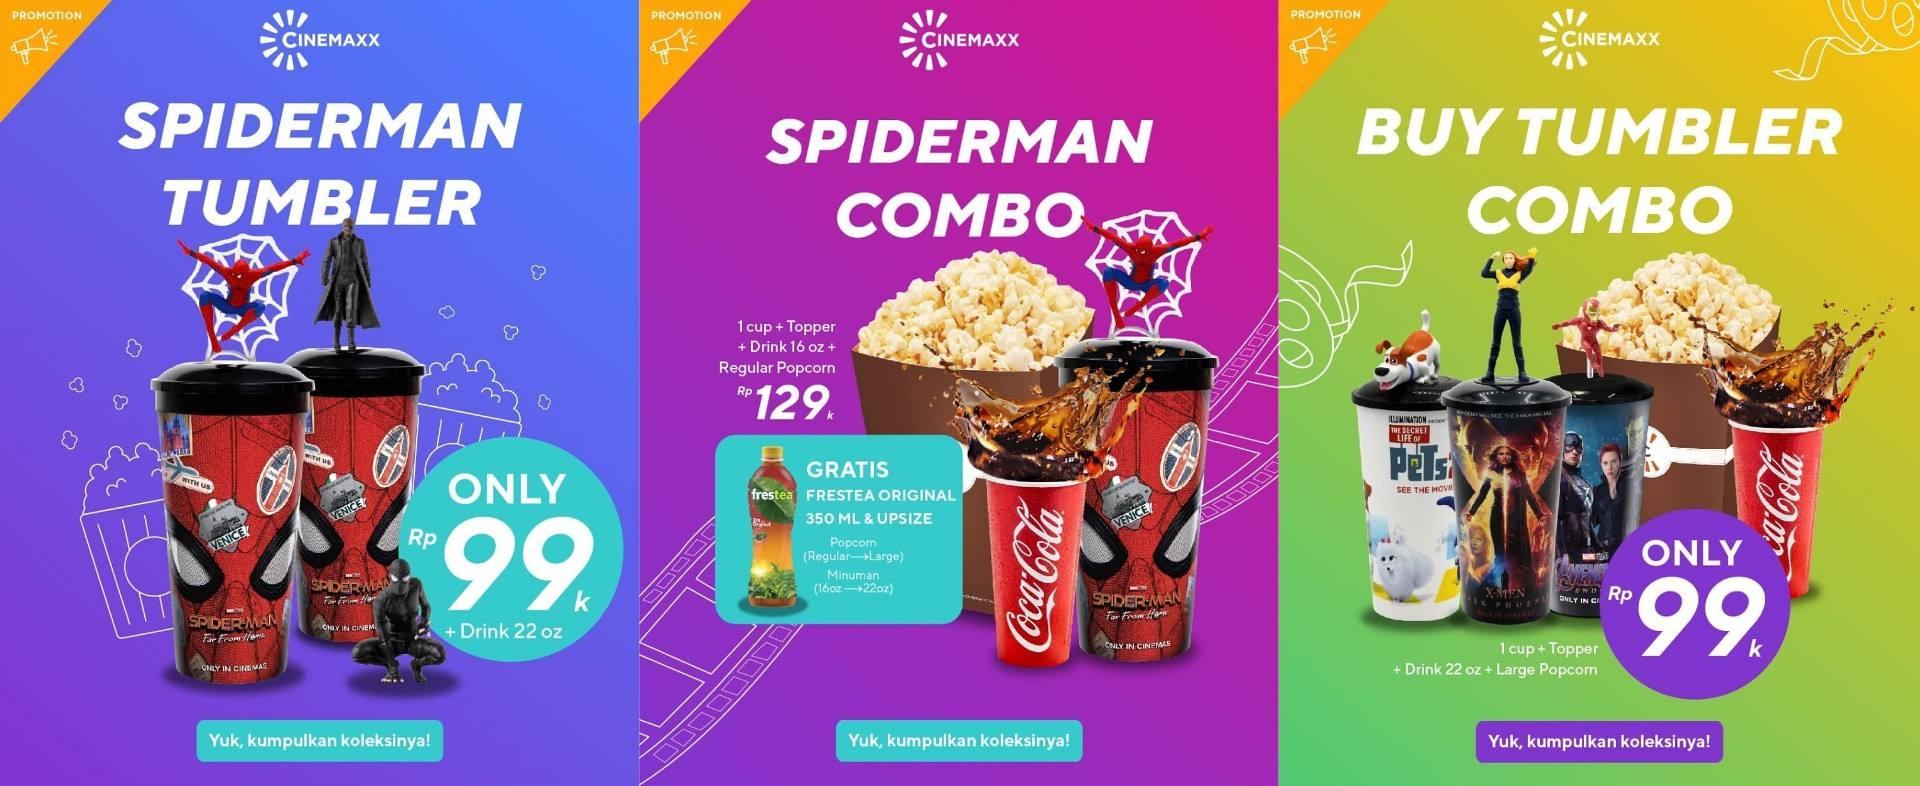 Diskon CINEMAXX Promo Paket dan Eksklusif Merchandise Spiderman Far From Home